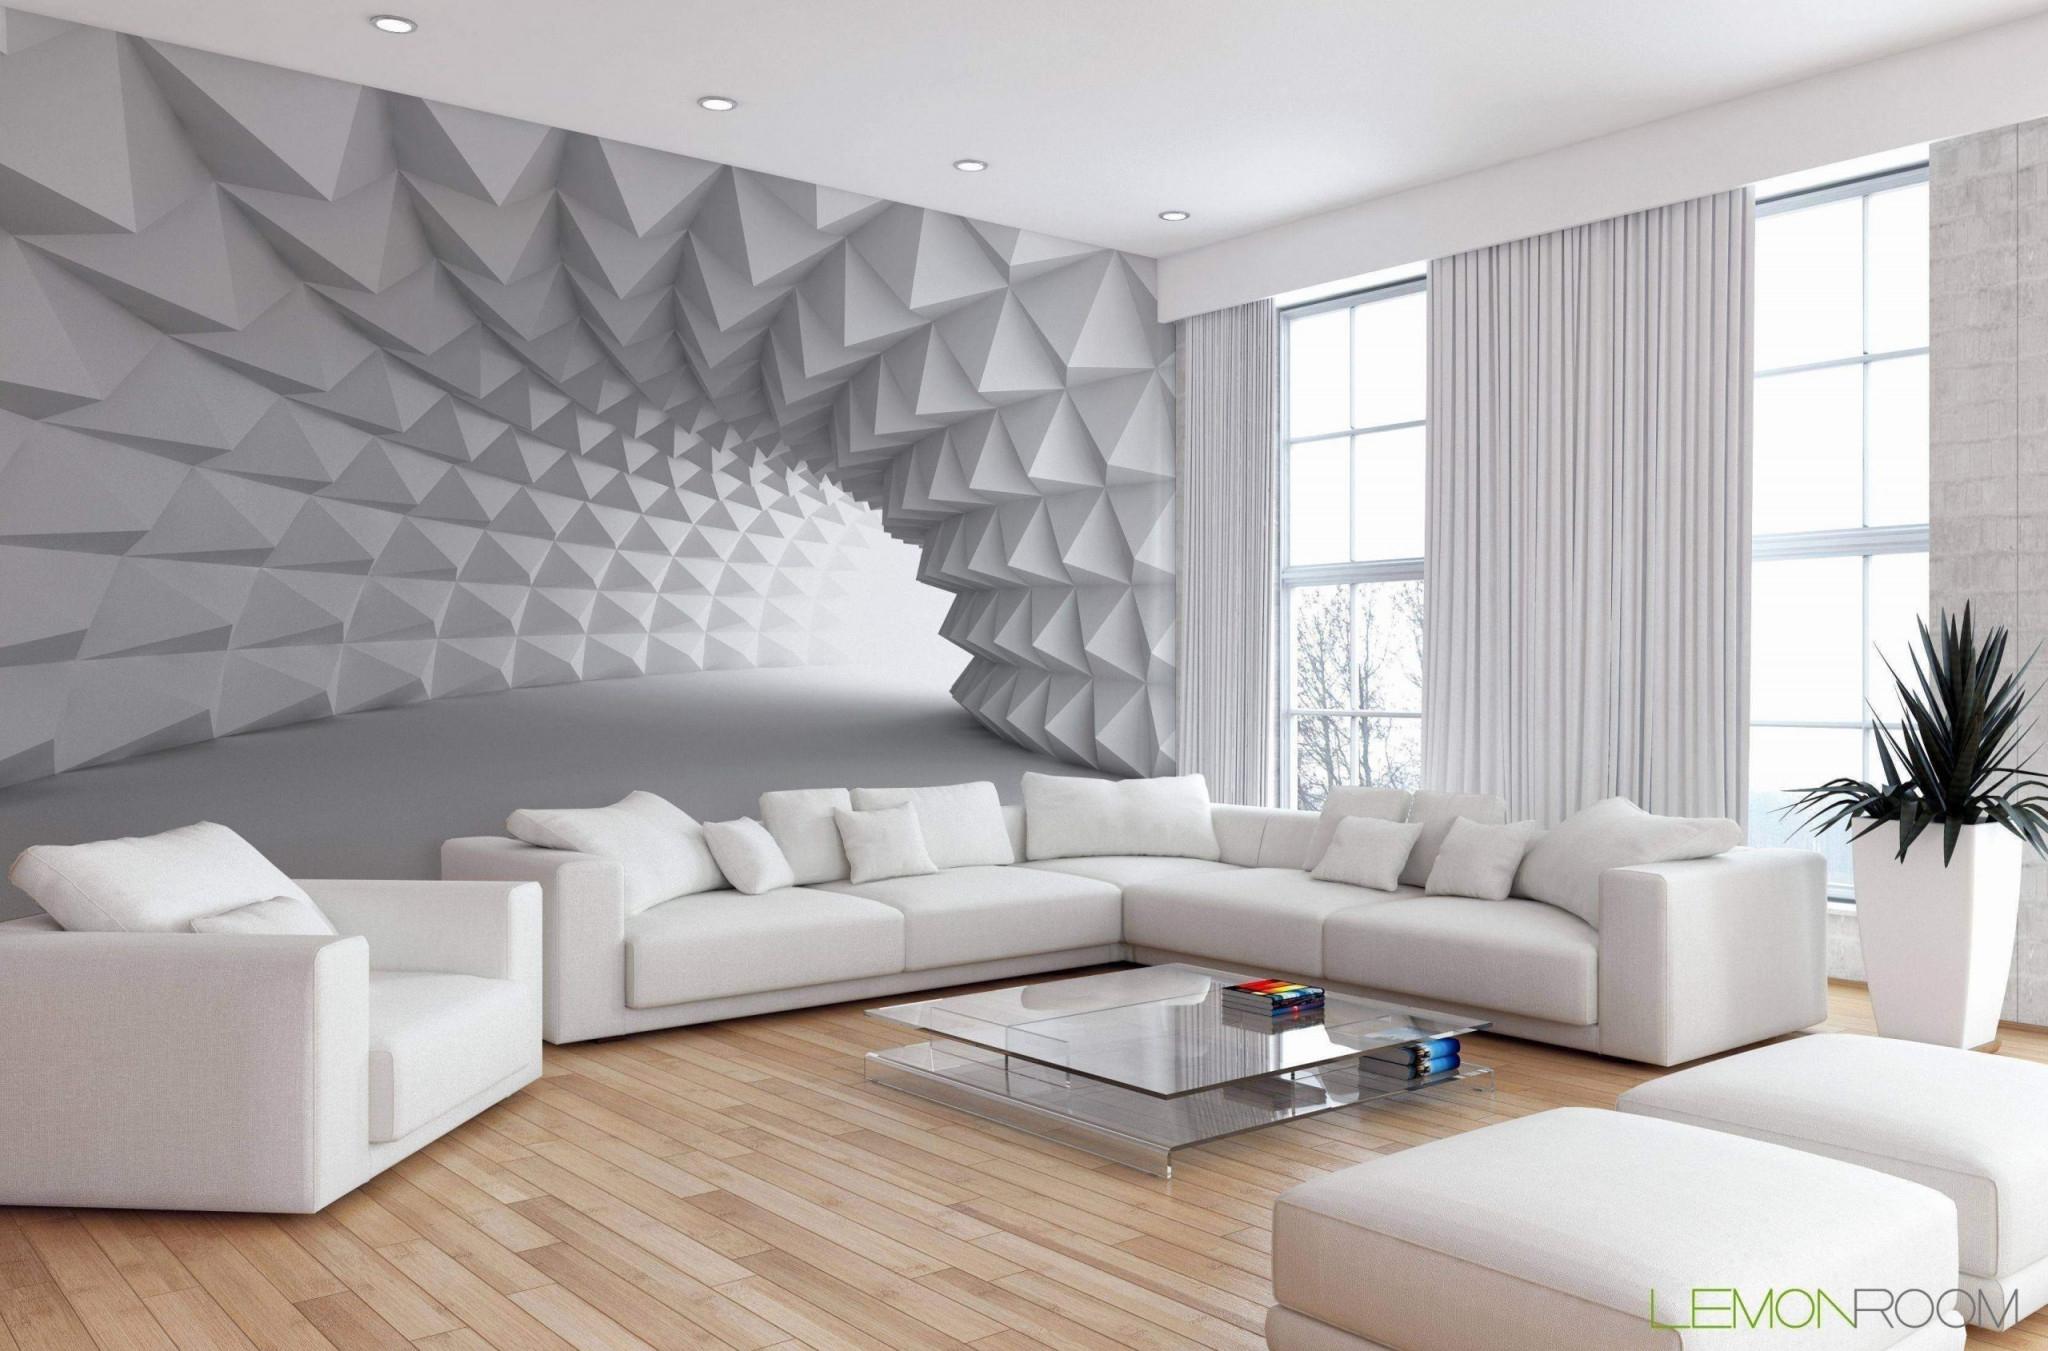 Tapeten Ideen Wohnzimmer In 2020  Design Living Room von Tapeten Im Wohnzimmer Ideen Photo